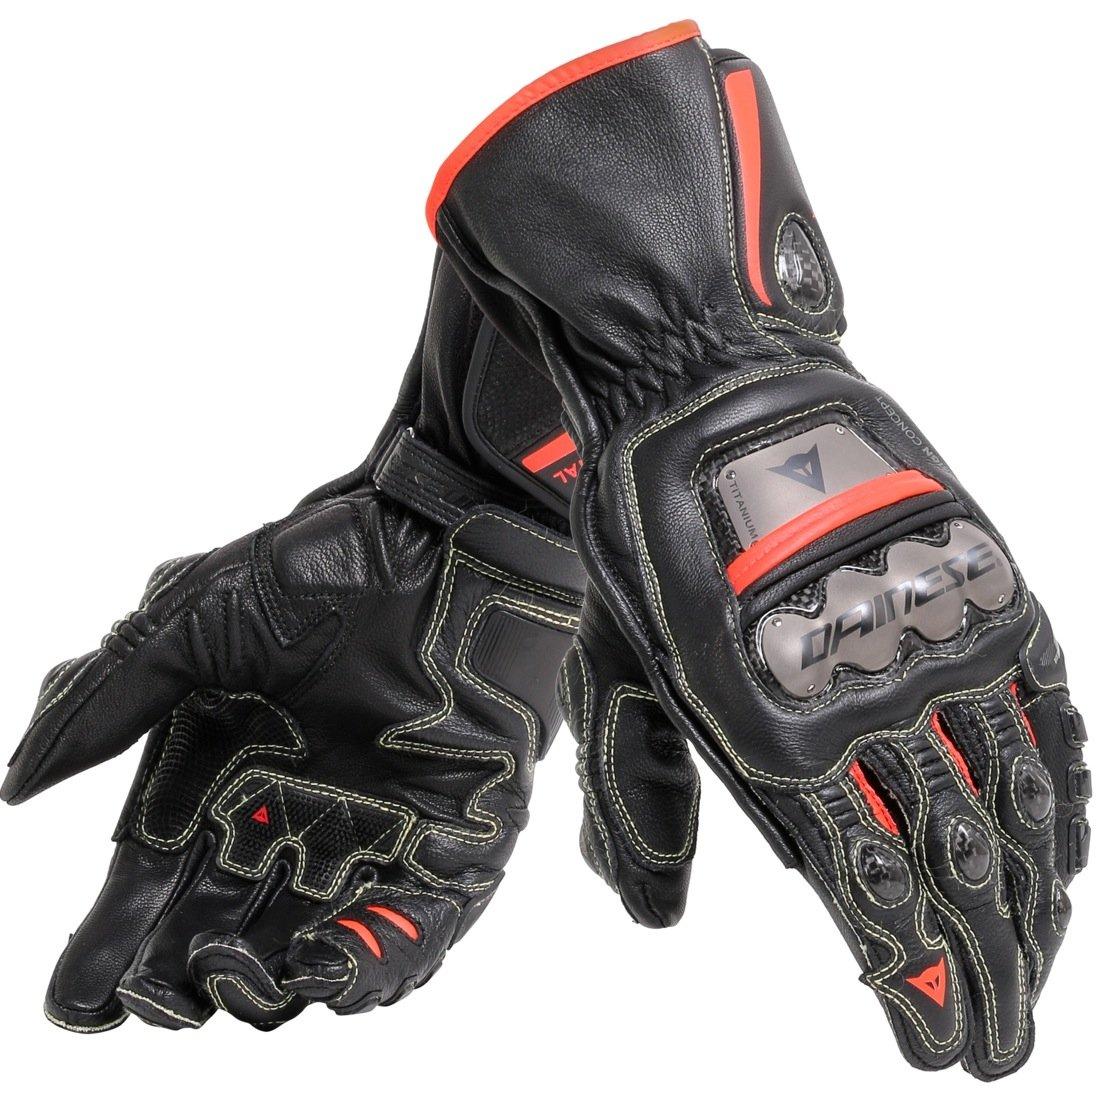 Dainese Full Metal 6 Leather Motorcycle Racing Gloves Black/Black/Fluo Red (Medium)